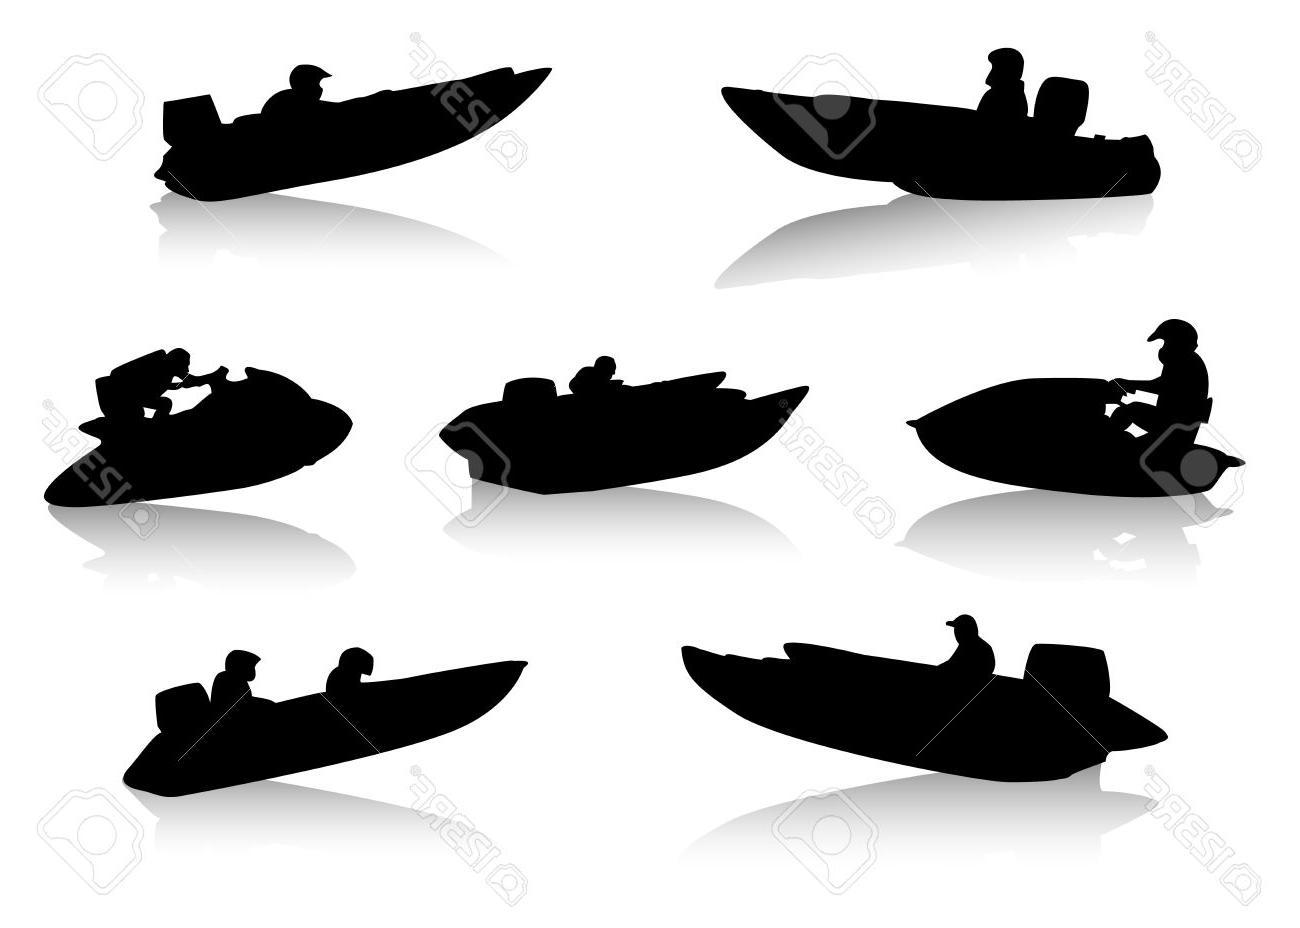 Motor Boat Silhouette At Getdrawings